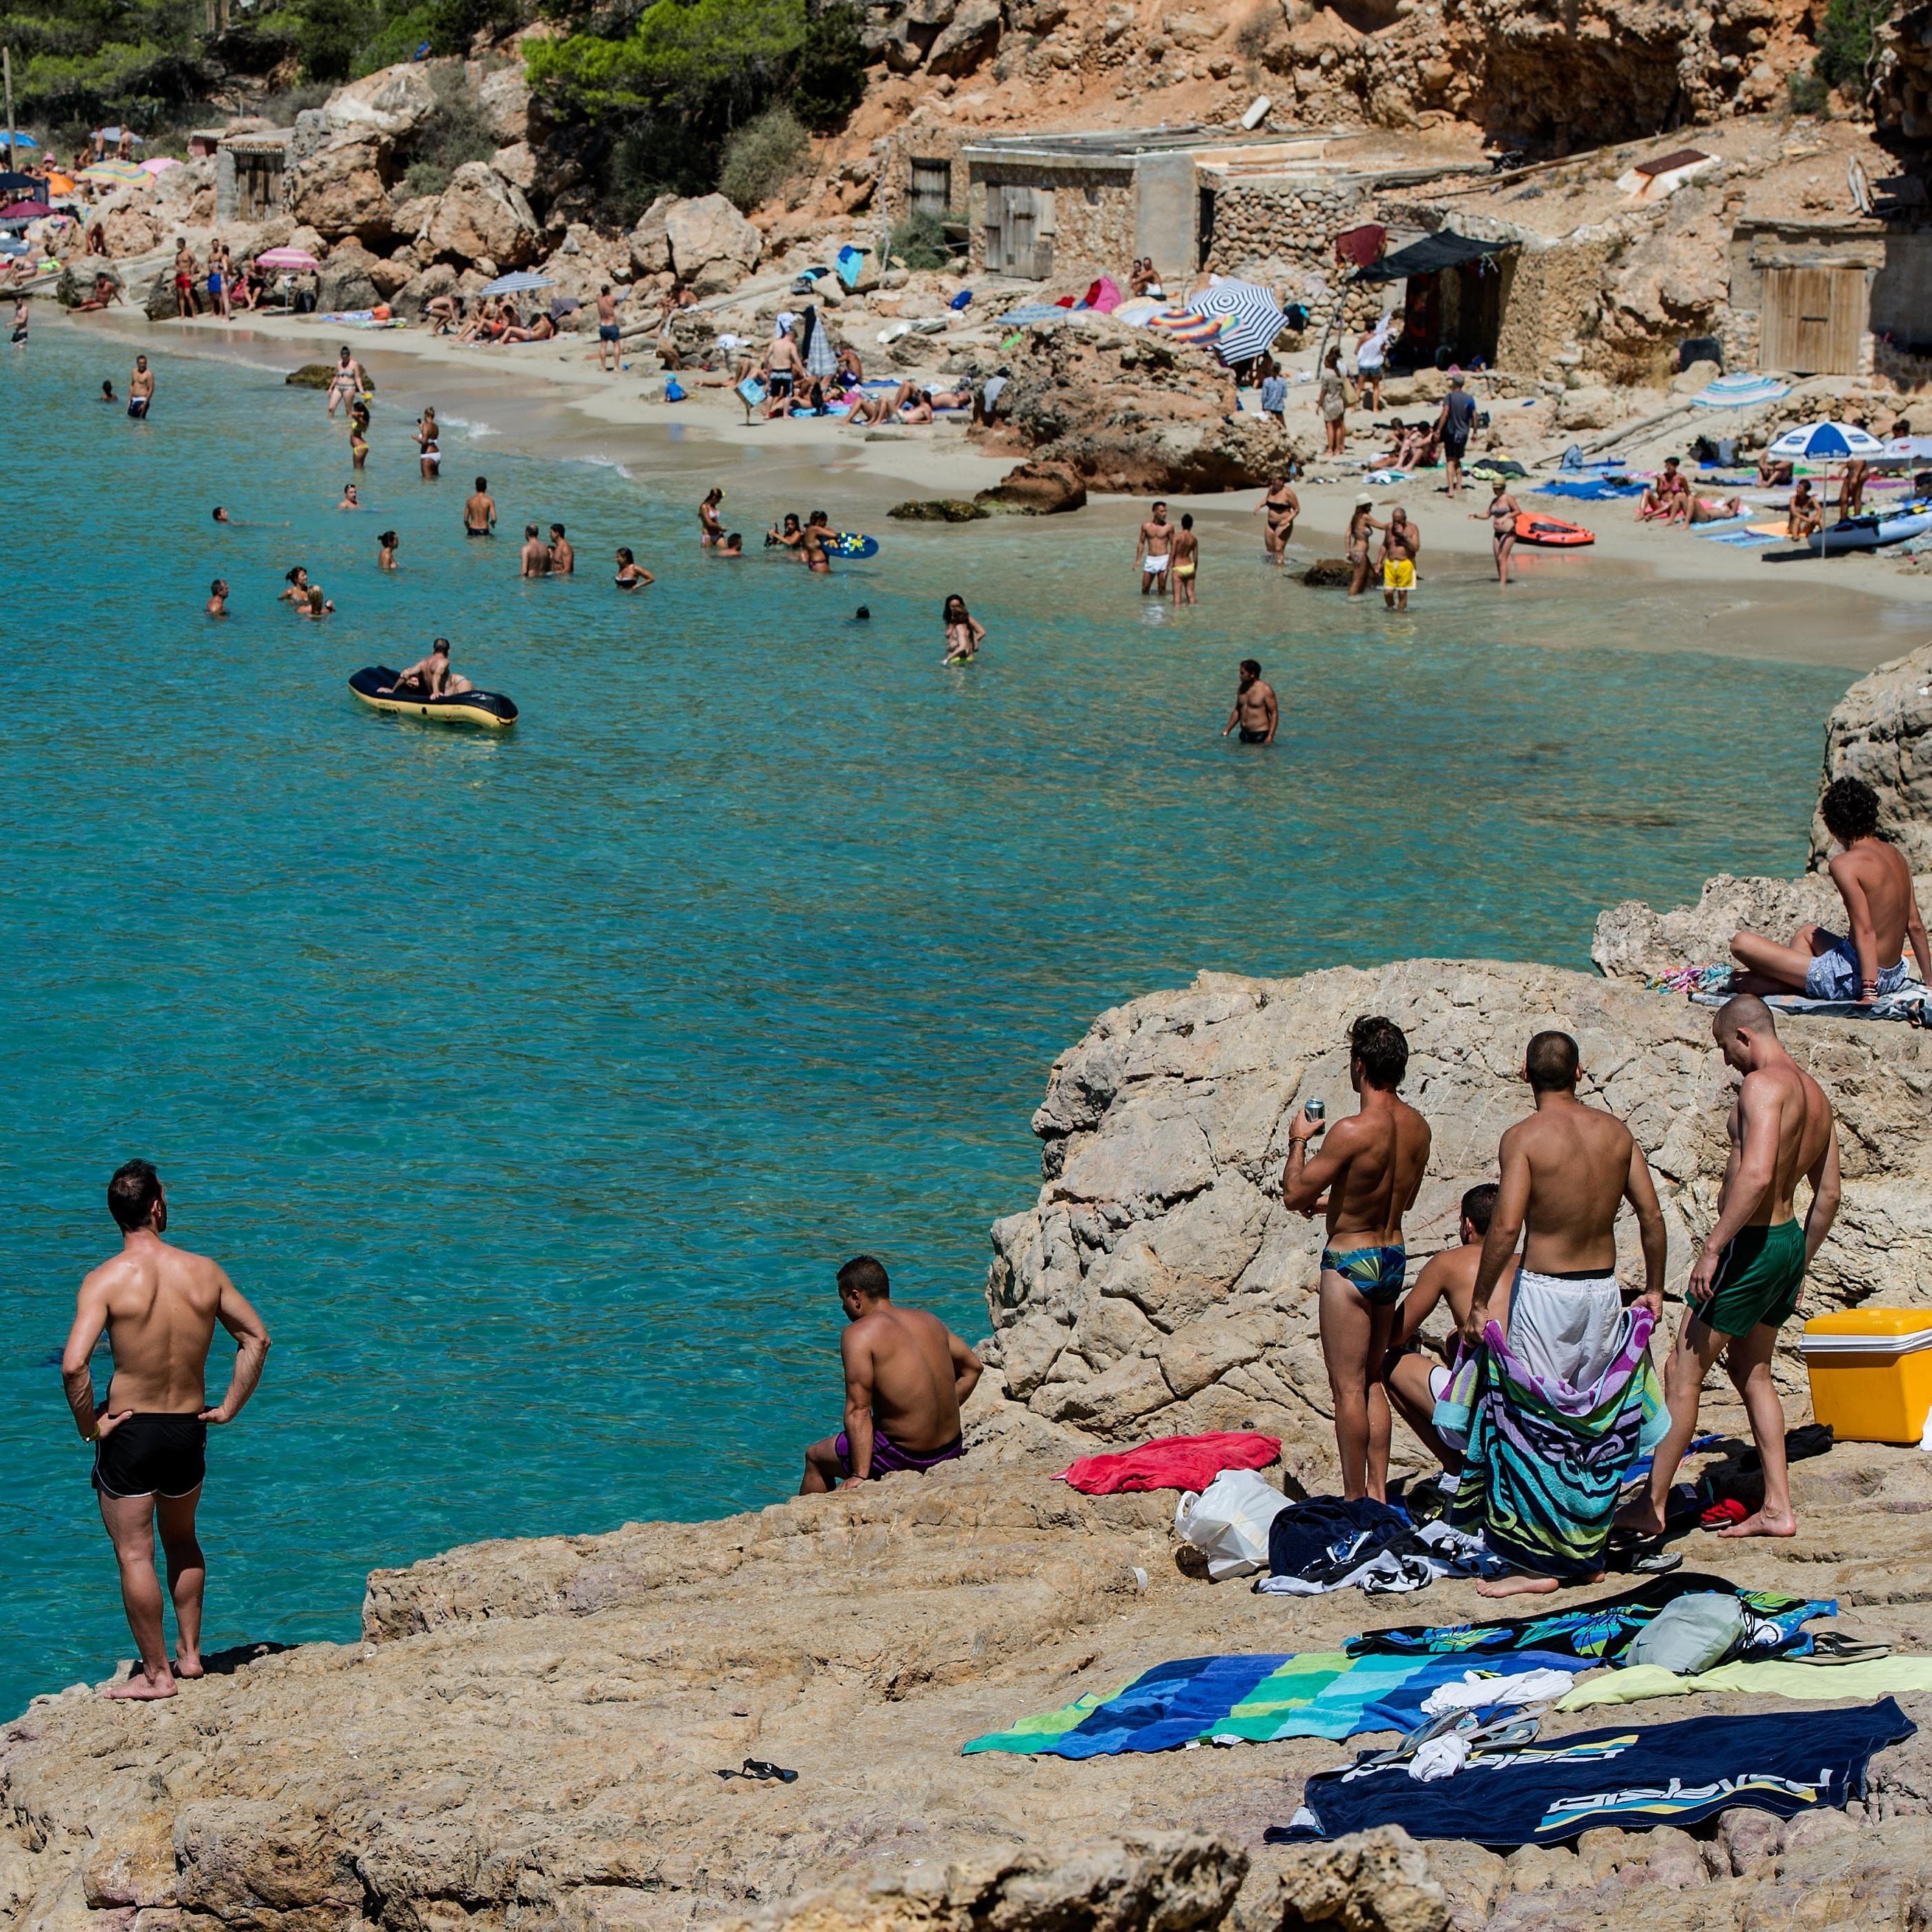 Island Beach People: Beachgoers In Spain Face Invasion Of Jellyfish